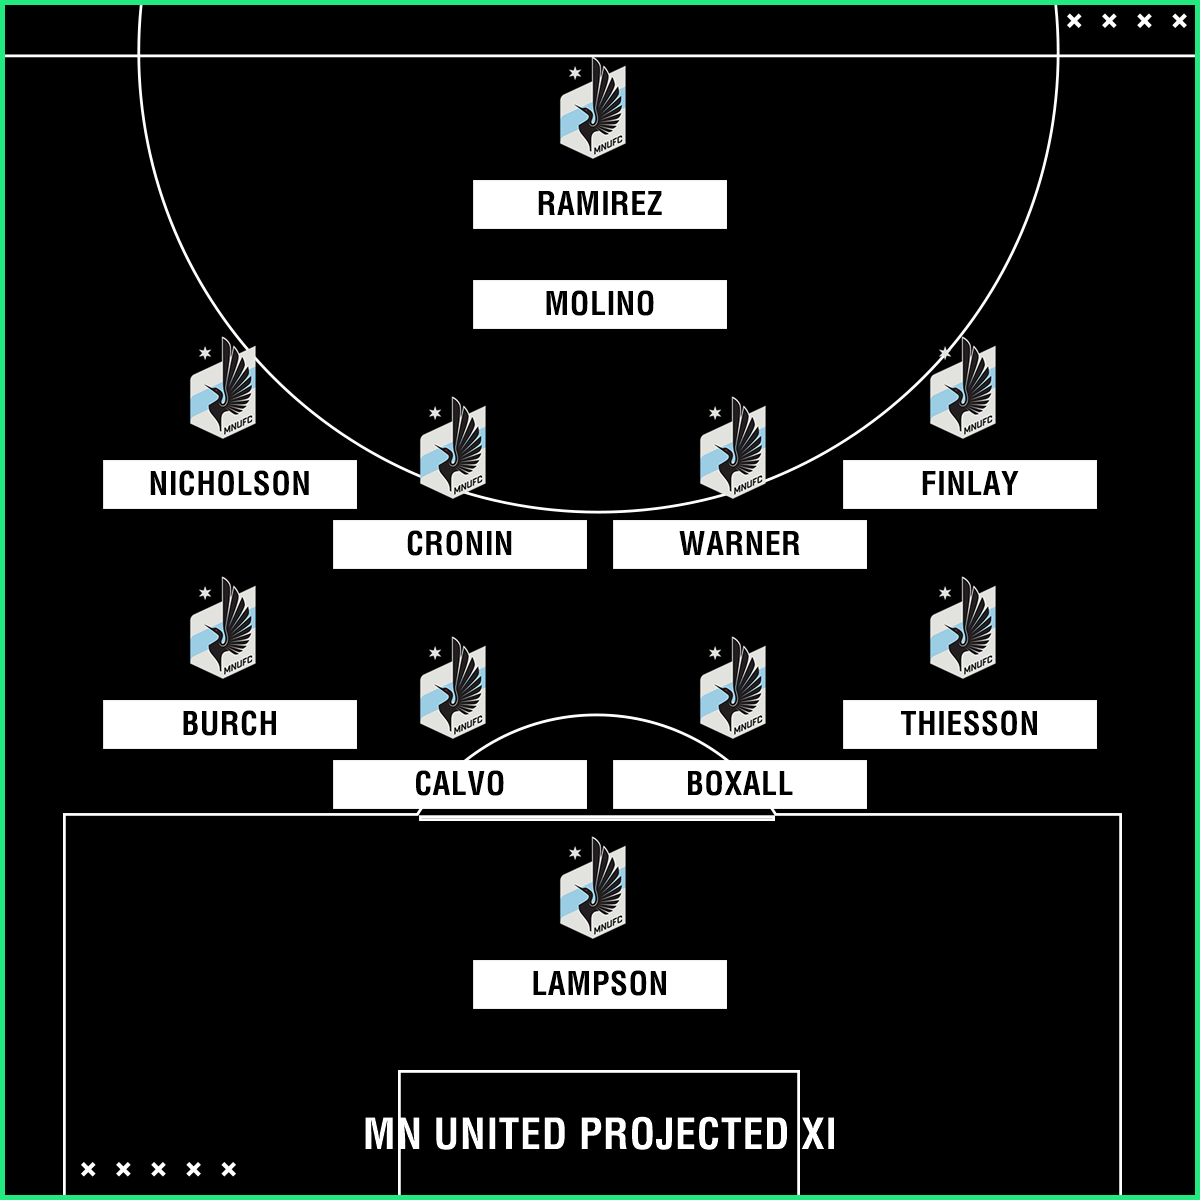 Minnesota United projected XI